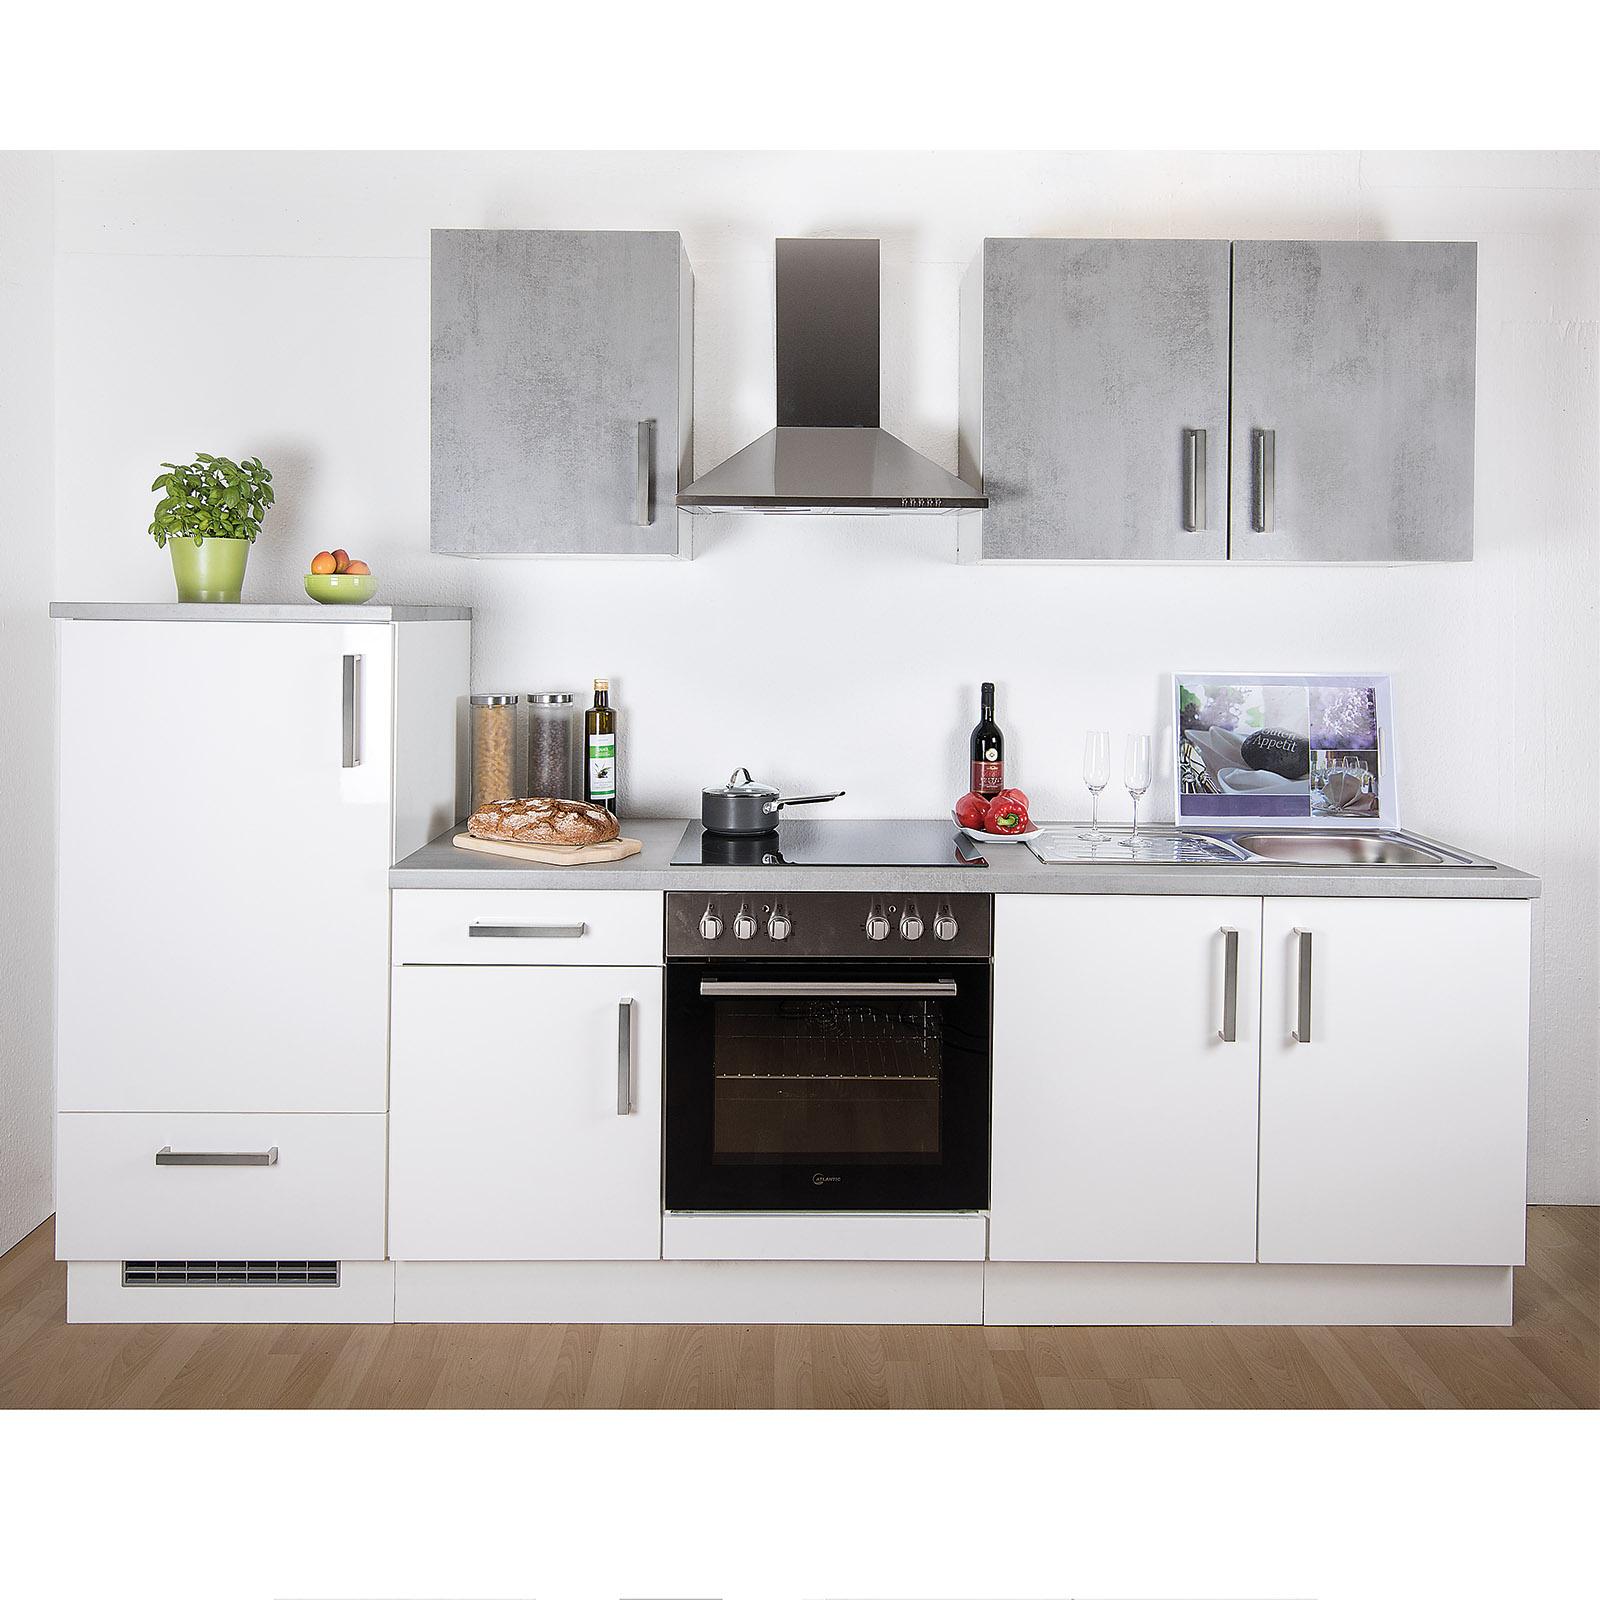 Küchenblock - weiß Hochglanz - Betonoptik - 270 cm